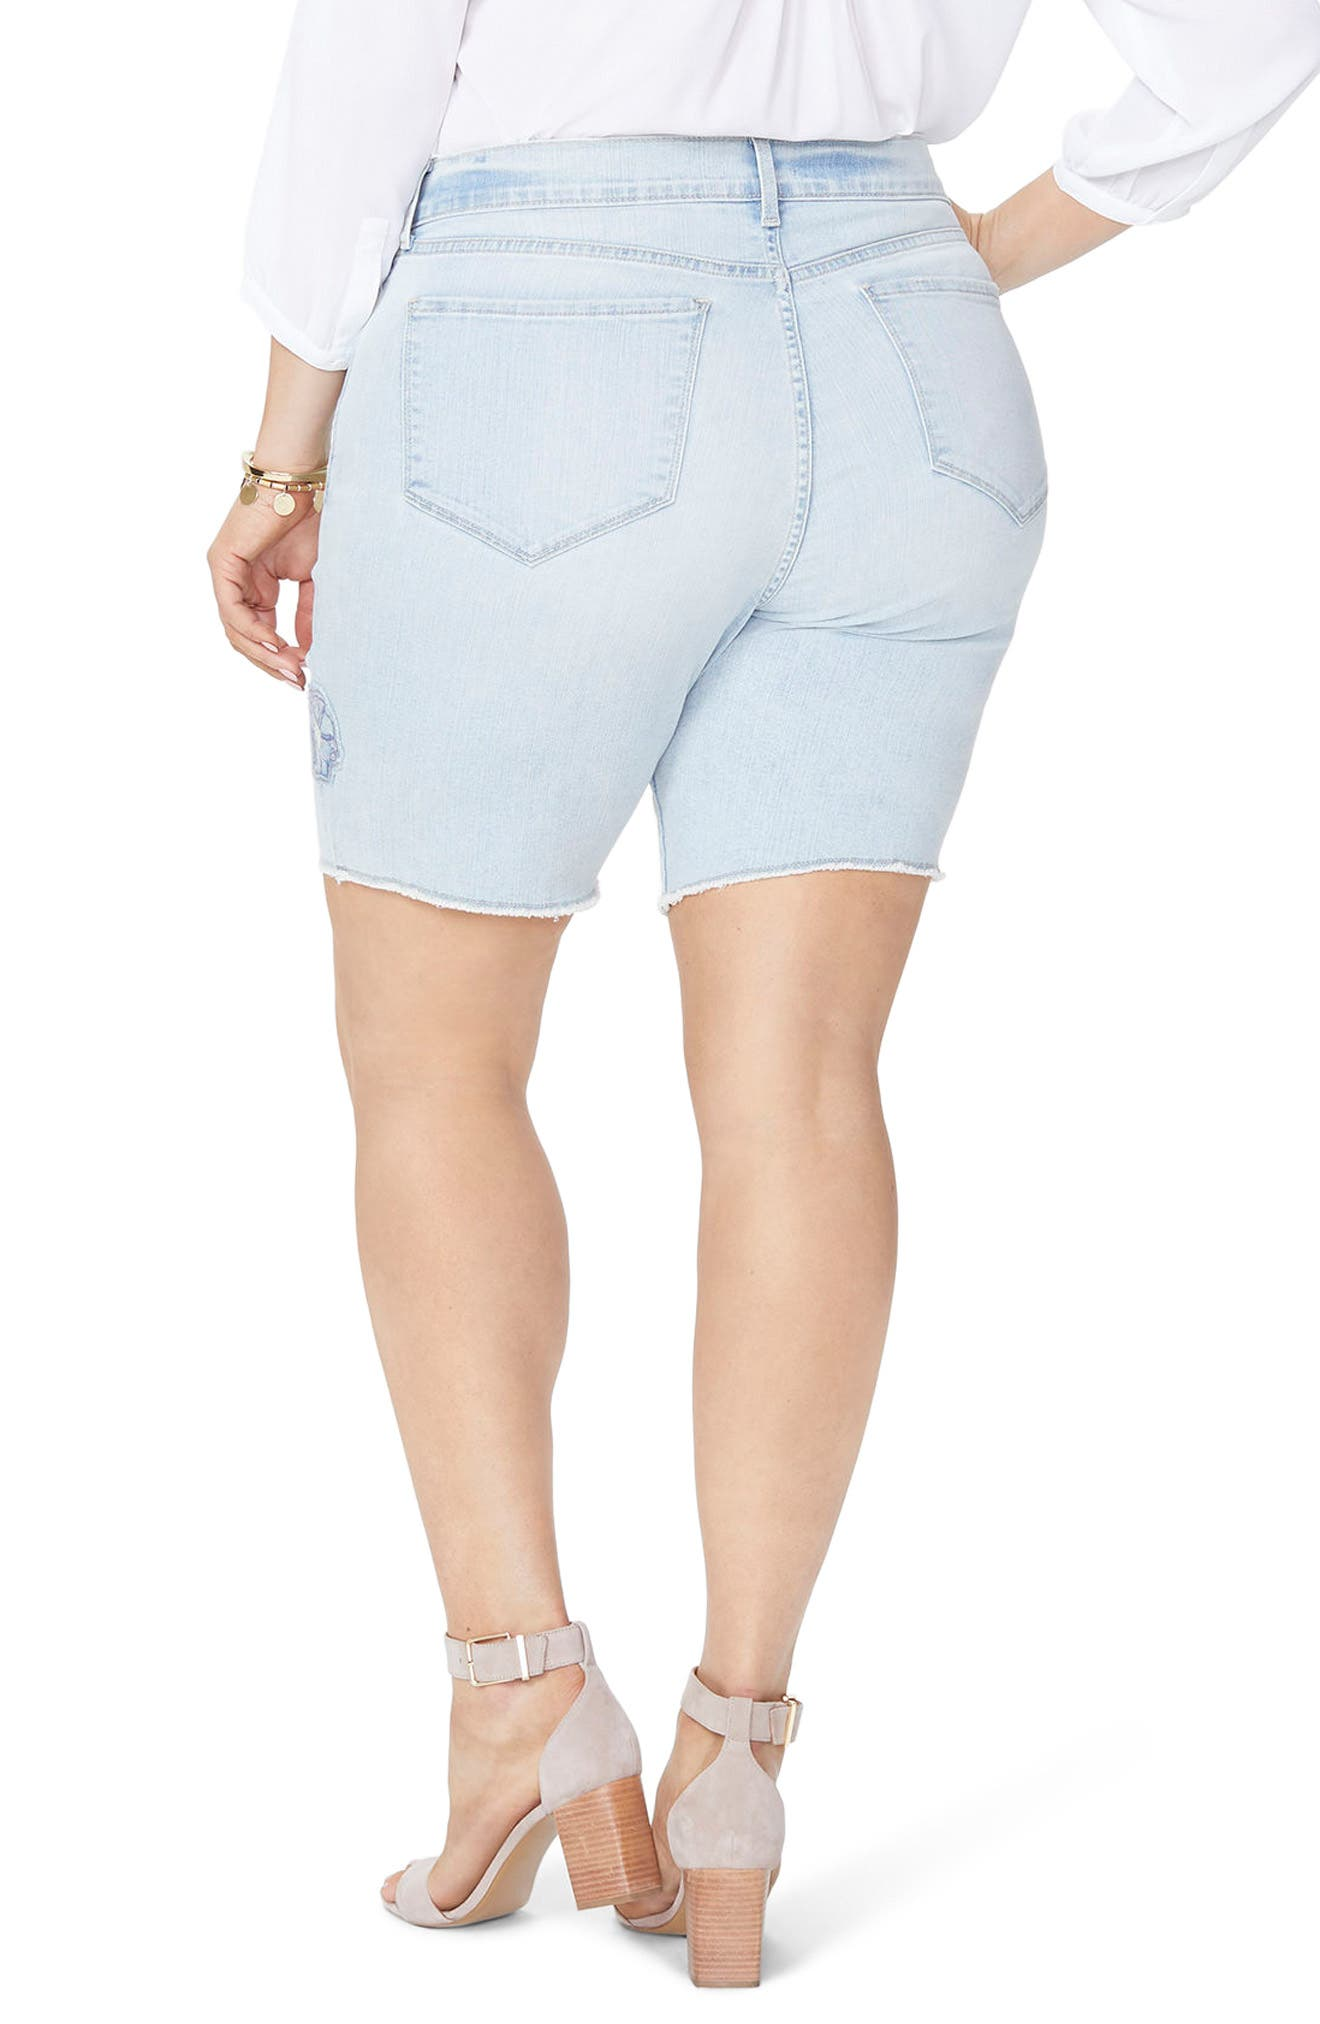 Briella Dream Blossom Denim Bermuda Shorts,                             Alternate thumbnail 2, color,                             Palm Desert